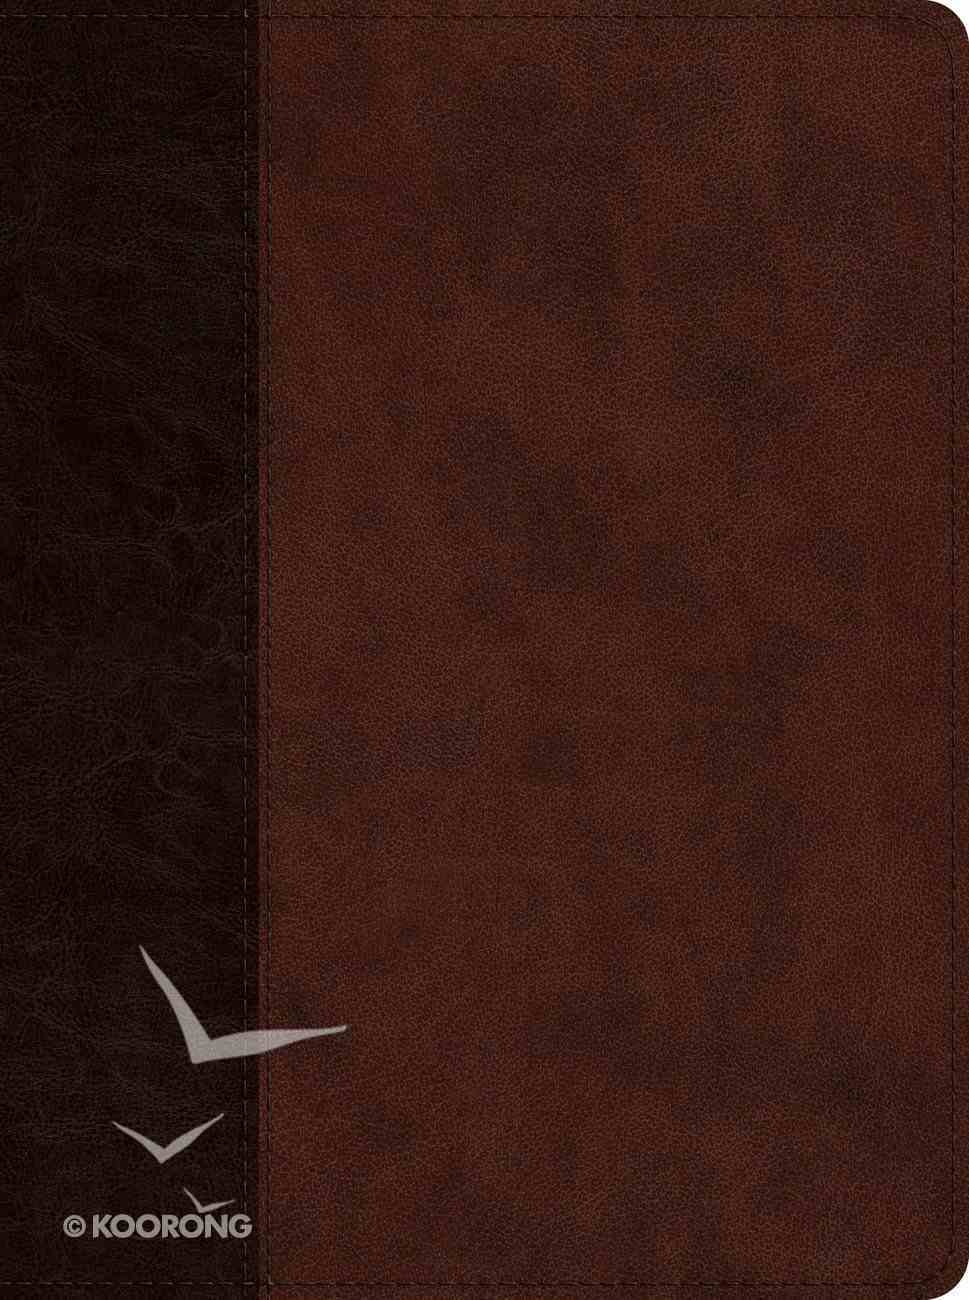 ESV Proverbs Daily Wisdom Brown/Walnut Timeless Design Imitation Leather